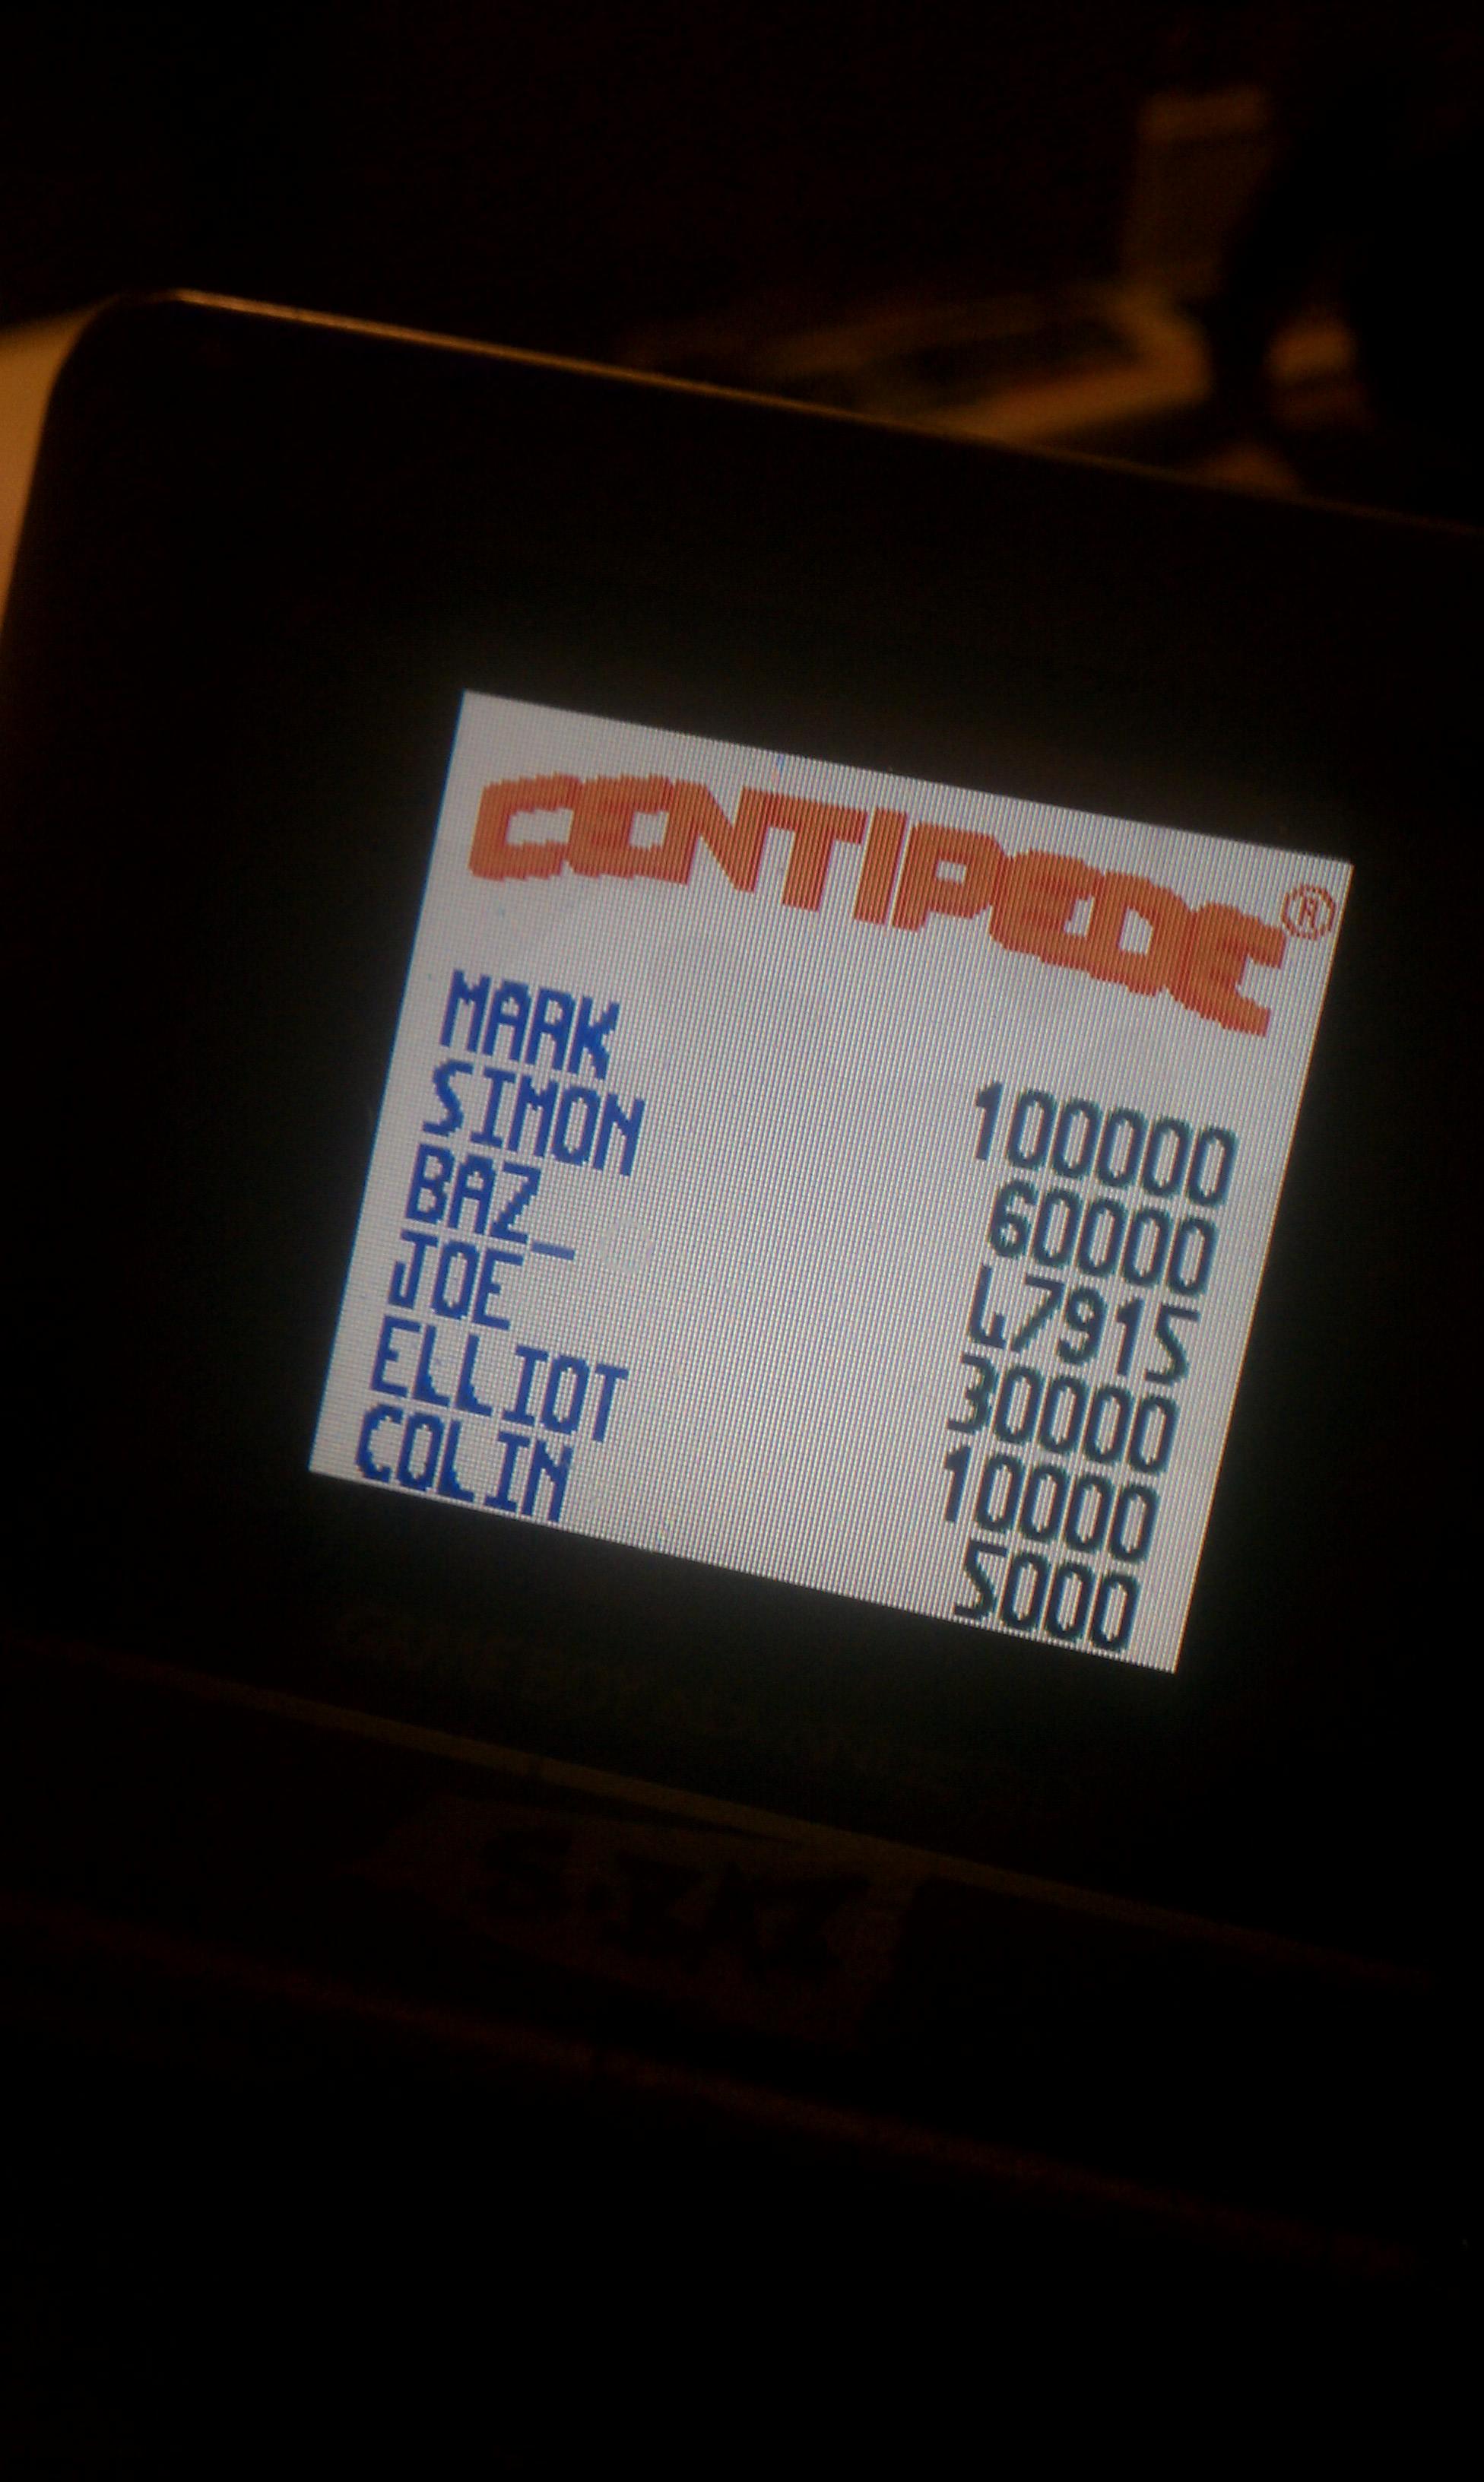 S.BAZ: Centipede (Game Boy Color) 47,915 points on 2020-07-14 18:46:16